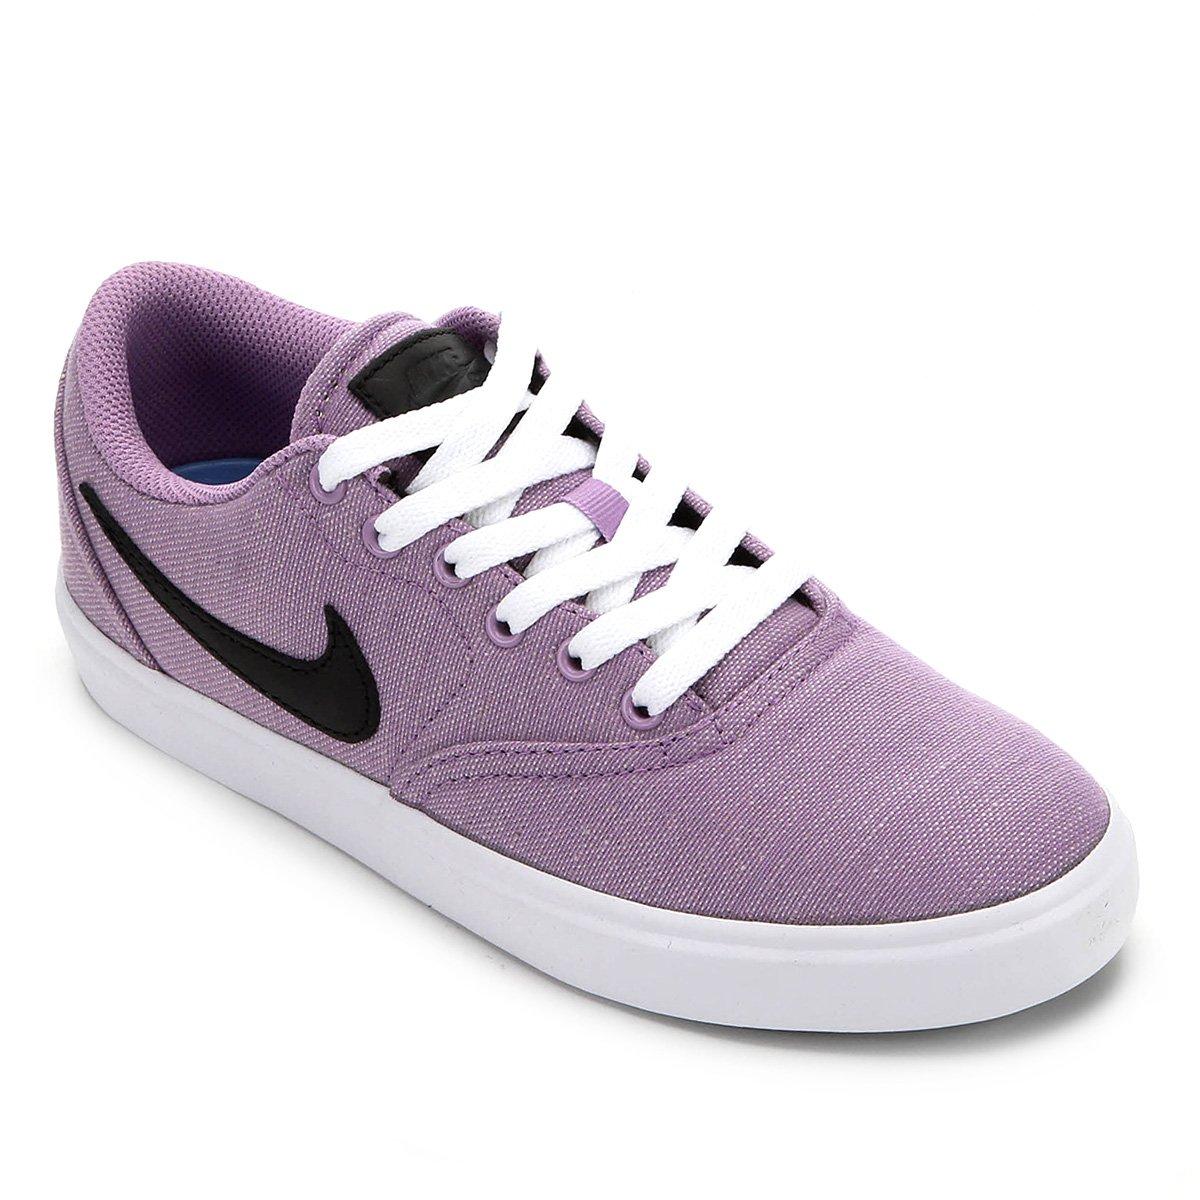 Tênis Nike Sb Check Solar Cvs P Feminino Lilás E Branco